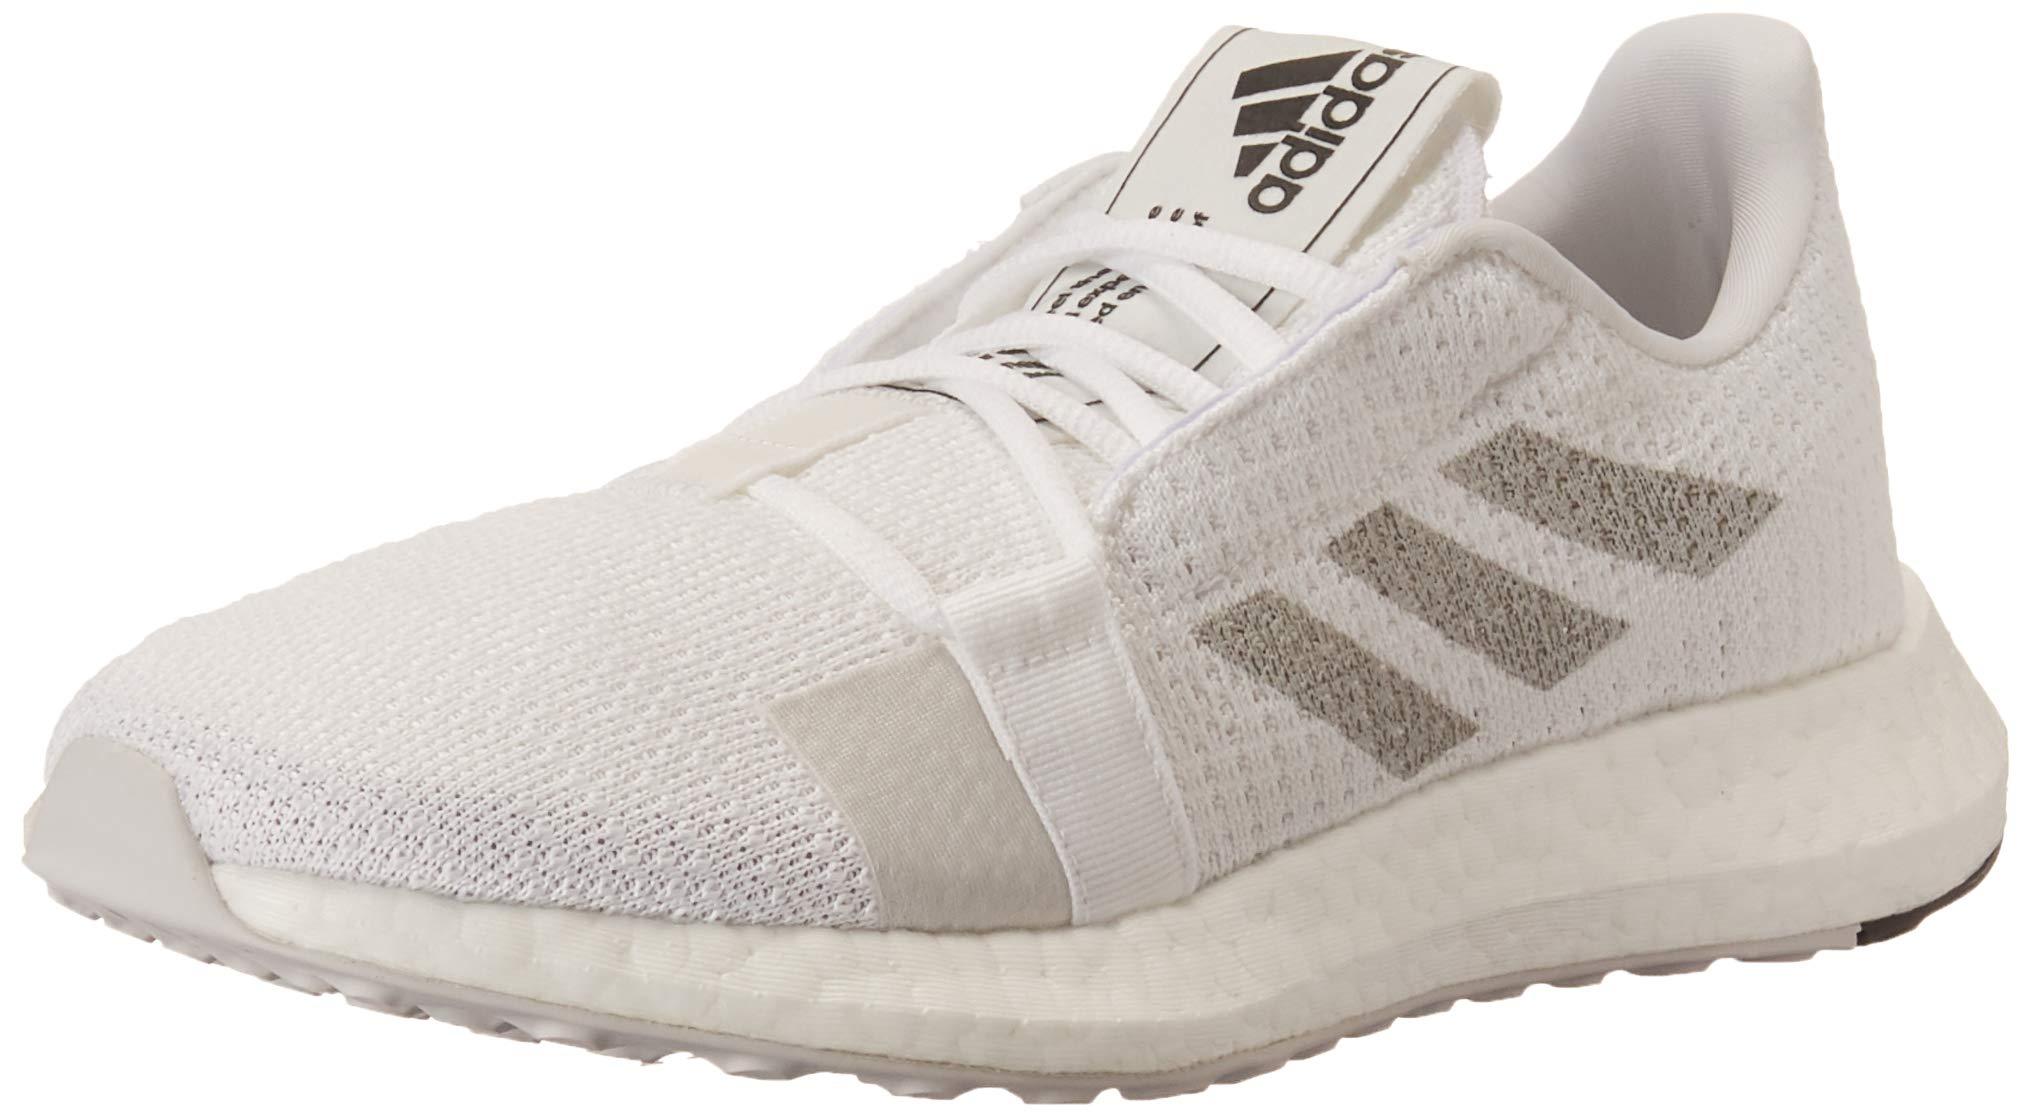 adidas Women's SenseBOOST GO Running Shoe, White/Grey/Black, 5 M US